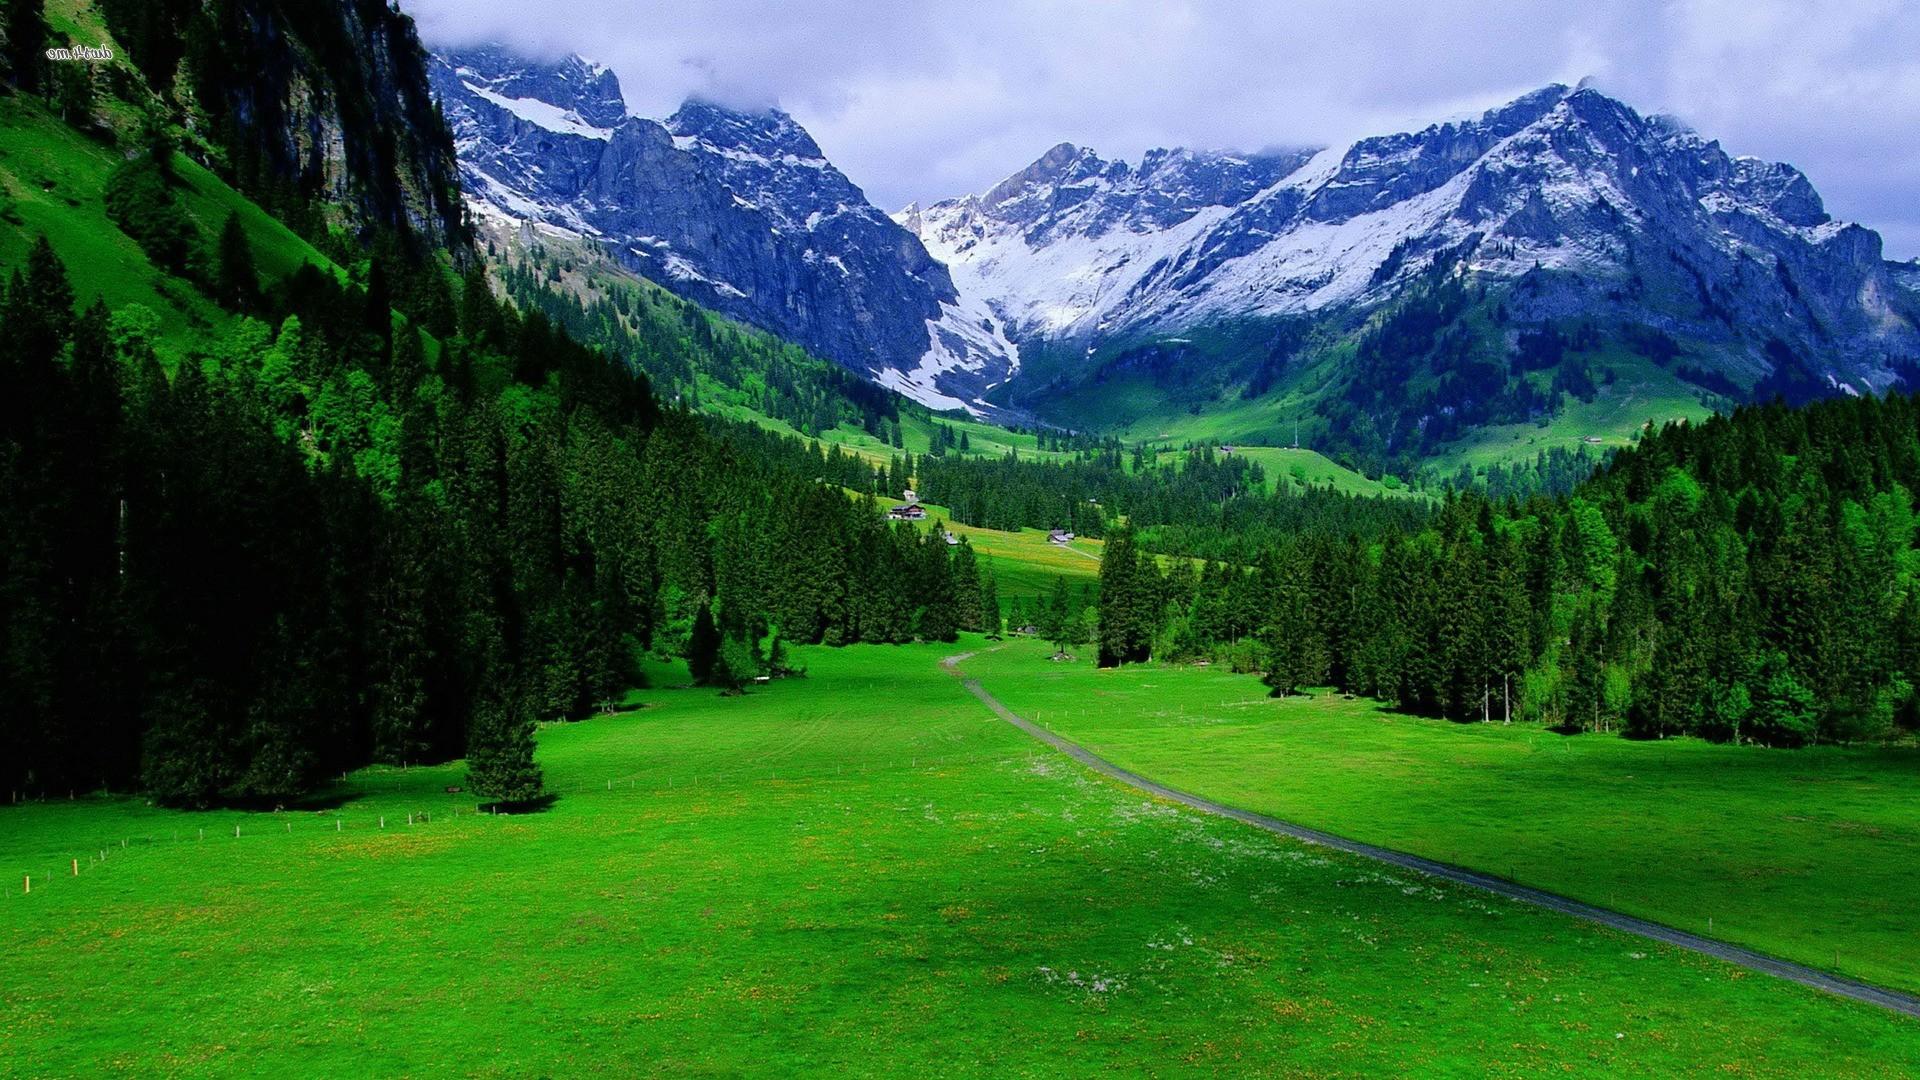 Natural Scene Photo